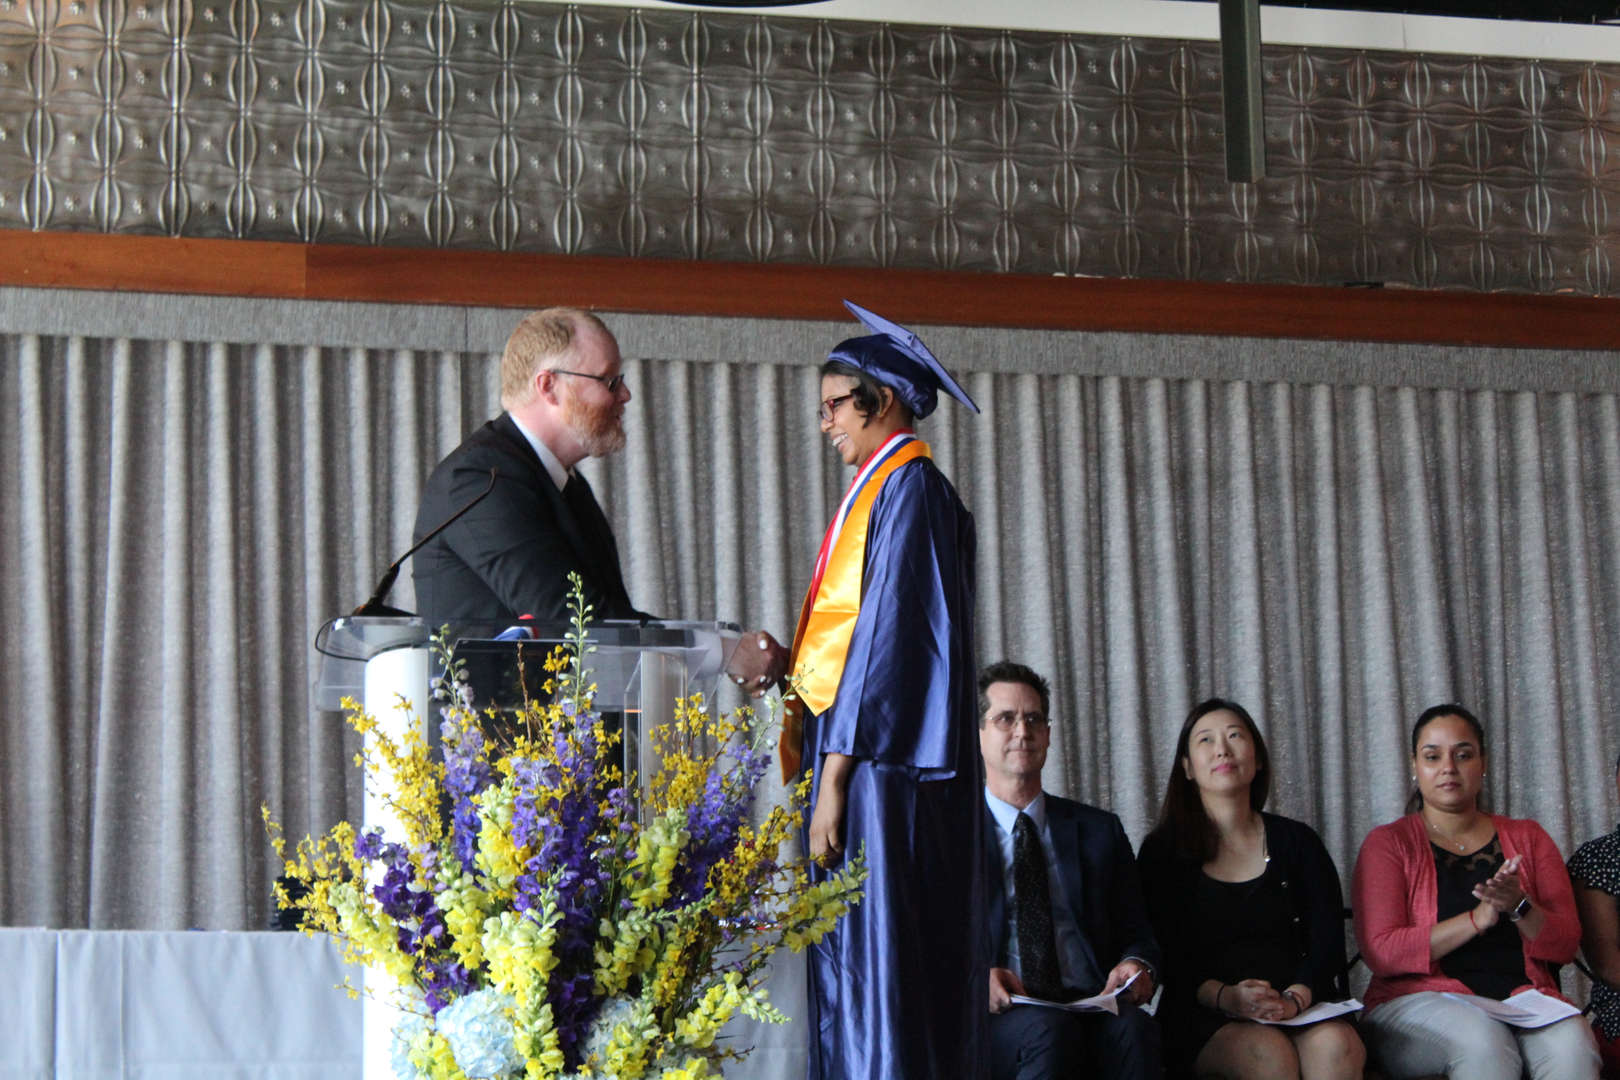 Mr. McBrien and Graduate